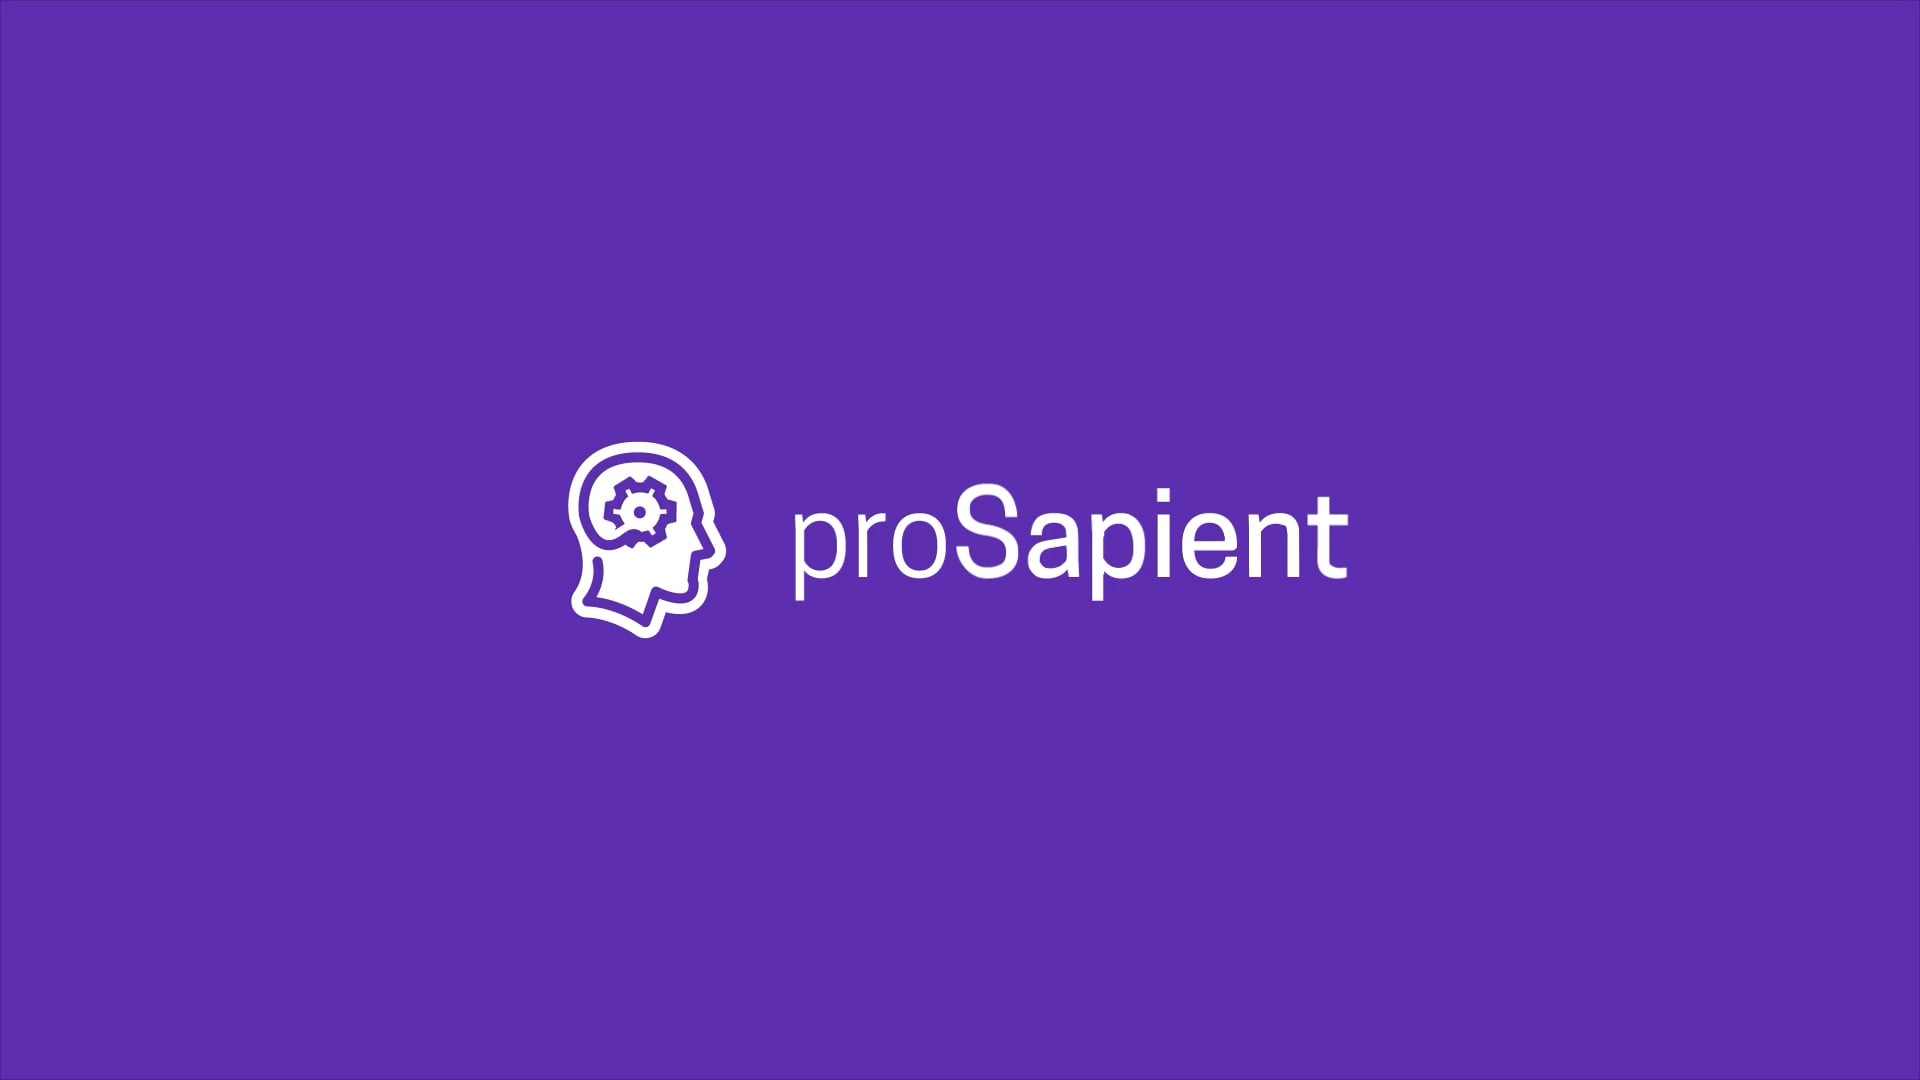 proSapient - Working at proSapient - our co-founder